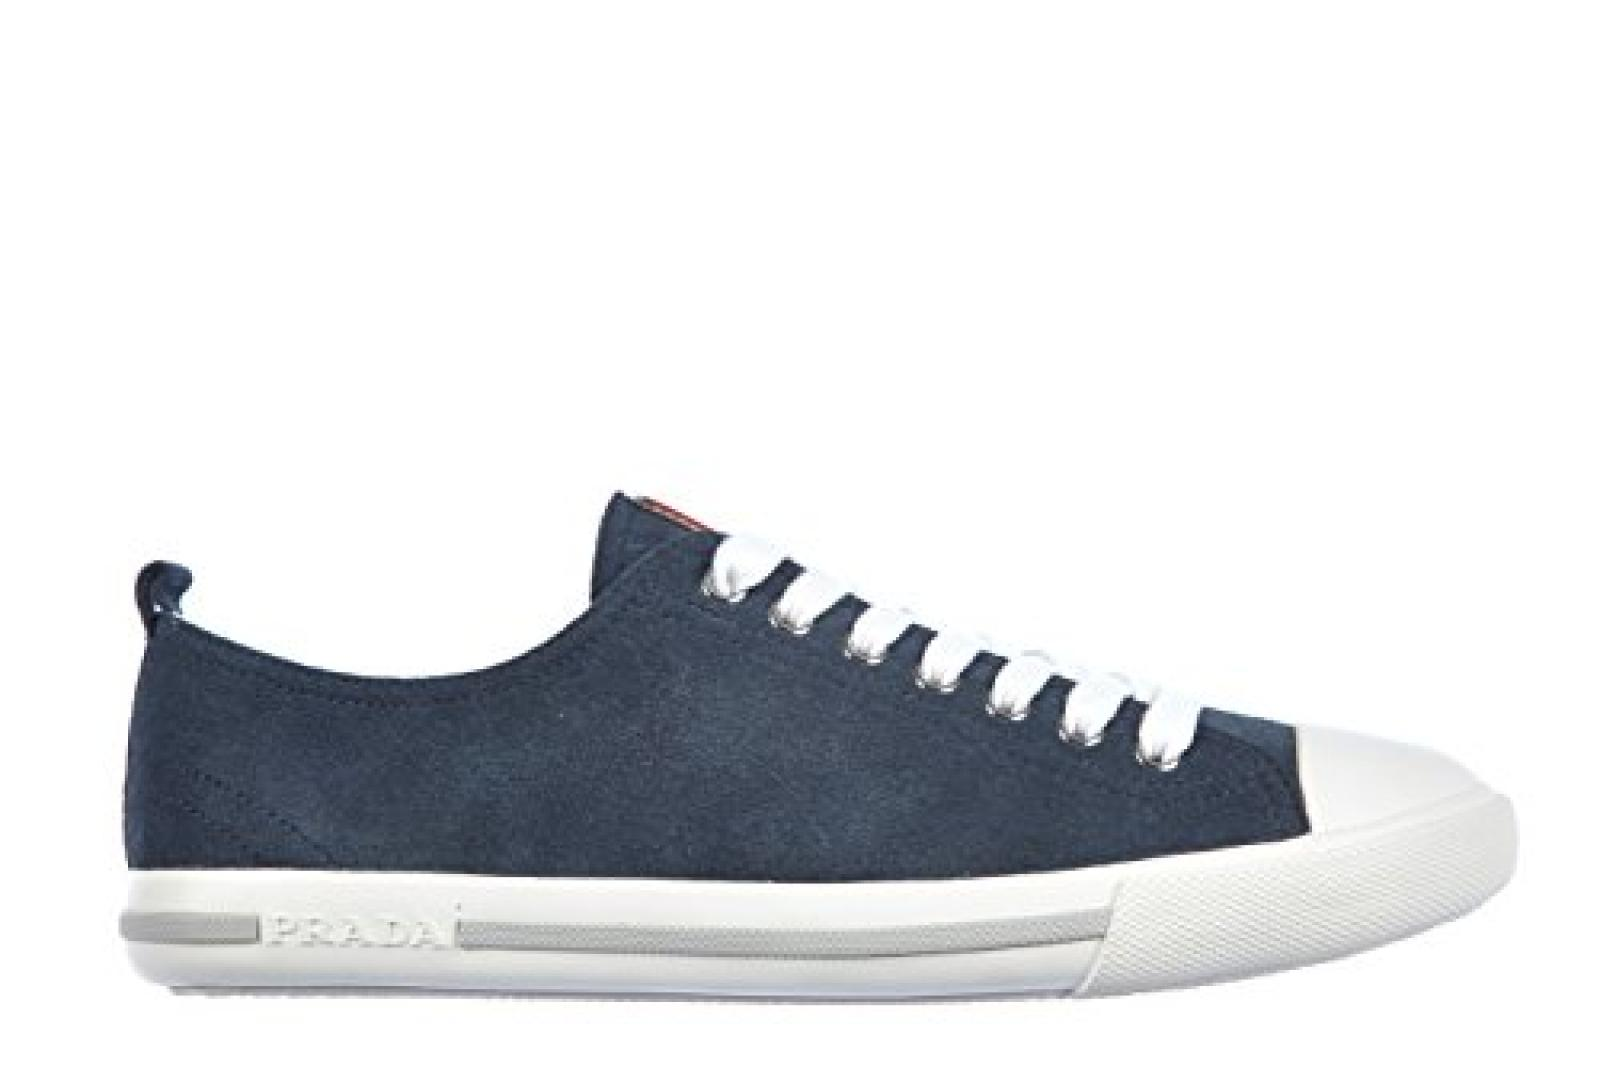 Prada Herrenschuhe Herren Wildleder Sneakers Schuhe velour blu